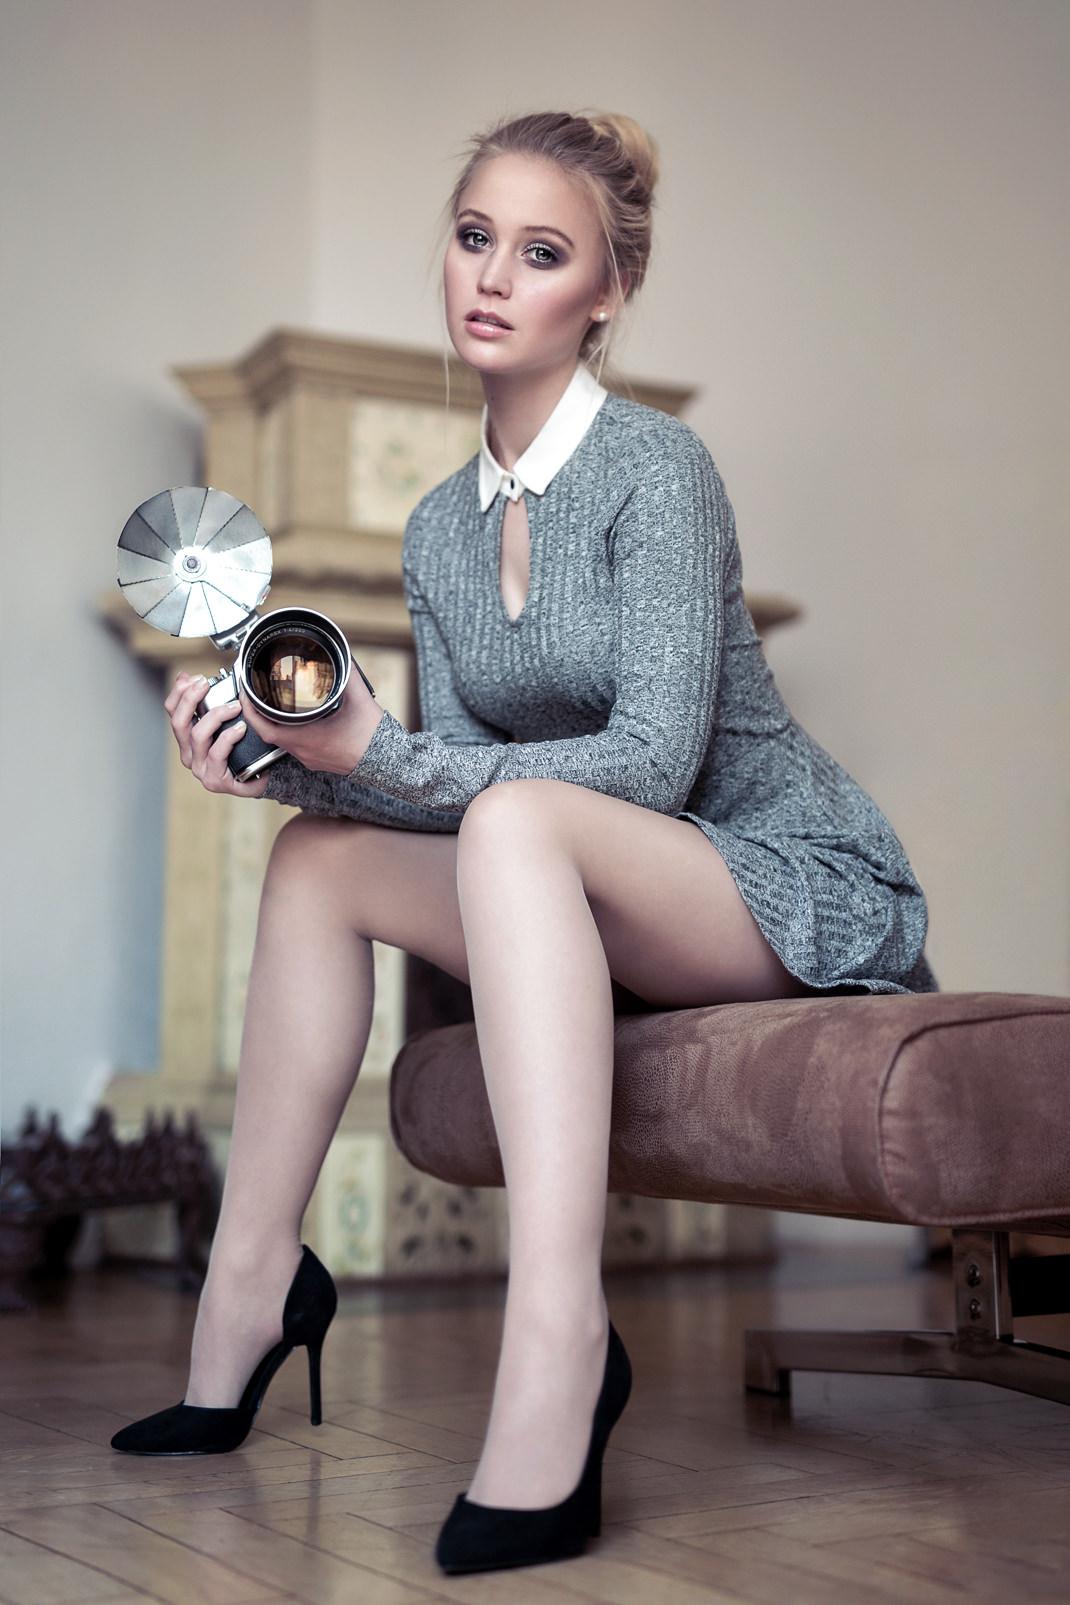 Two Beauties - Antonia & Voigtländer Bessamatic with Super Dynarex 200 - Markus Hertzsch - Camera - Girl